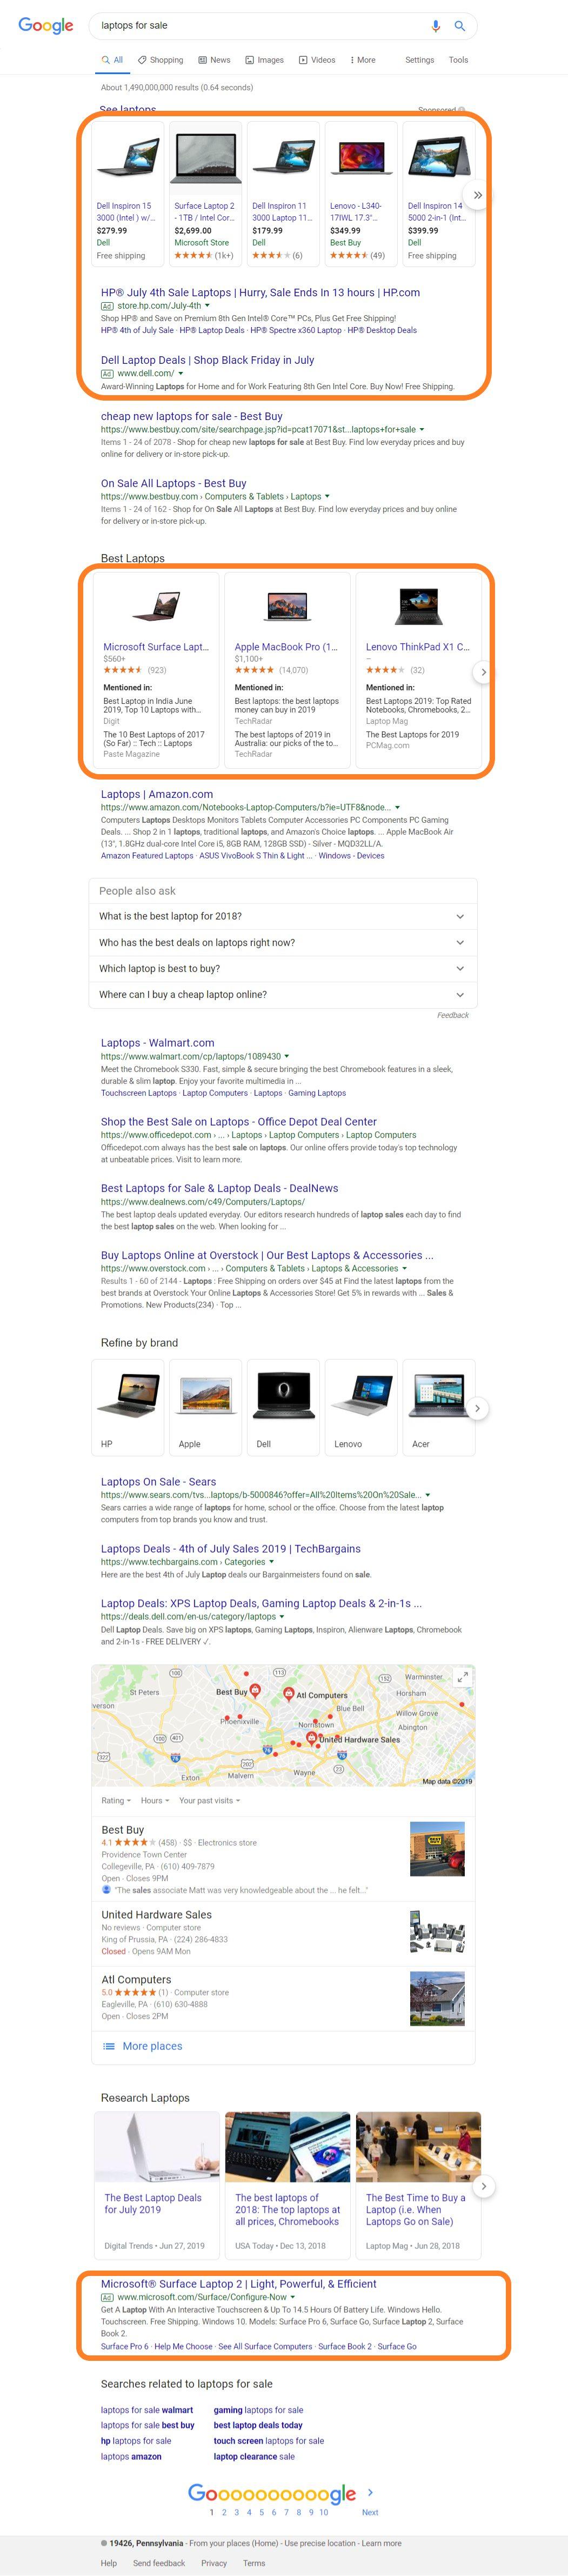 ecommerce ppc serp google